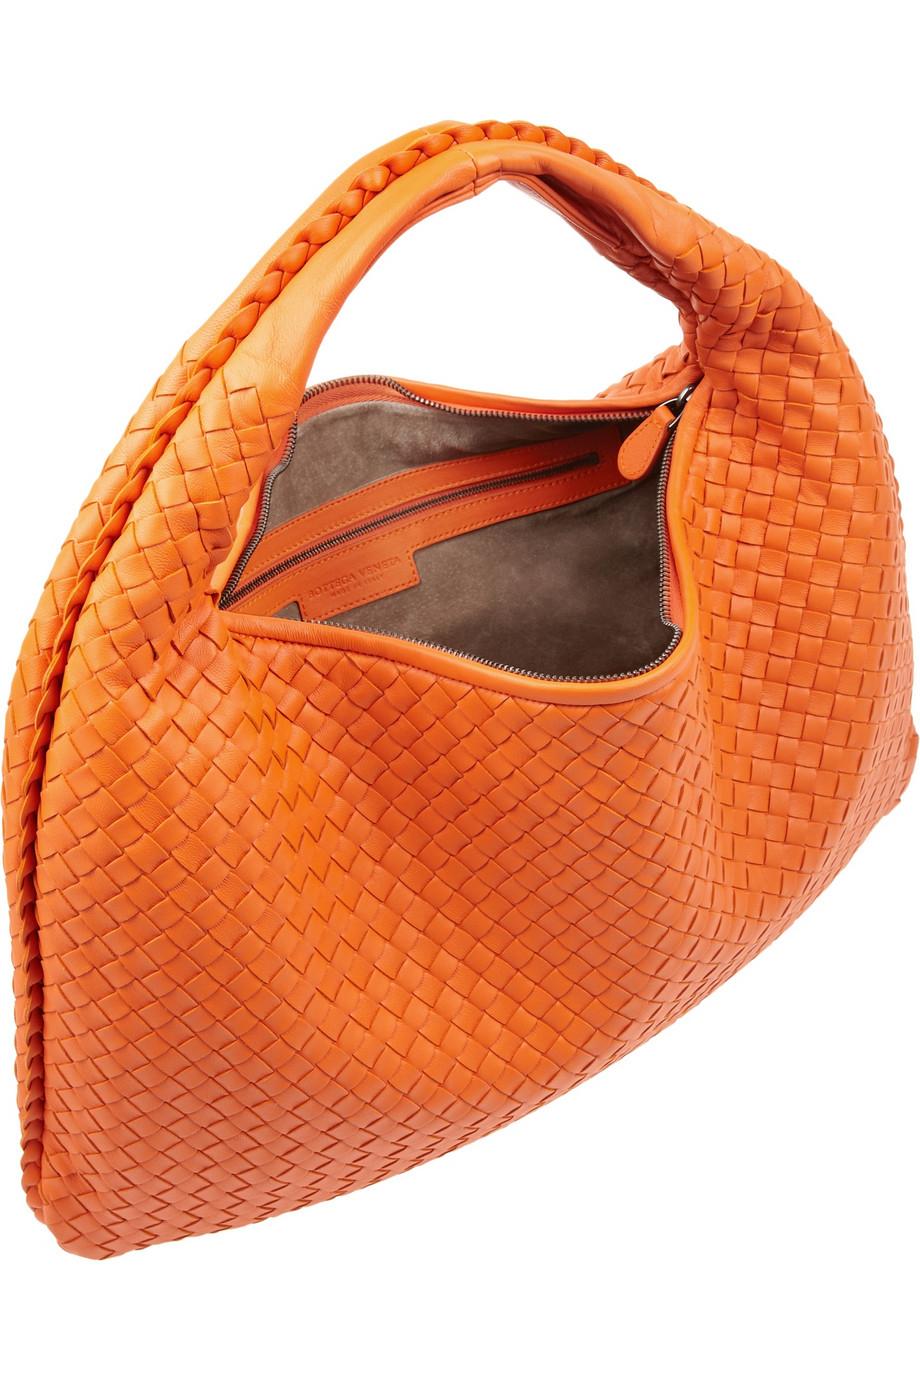 Bottega Veneta Large Intrecciato Leather Shoulder Bag